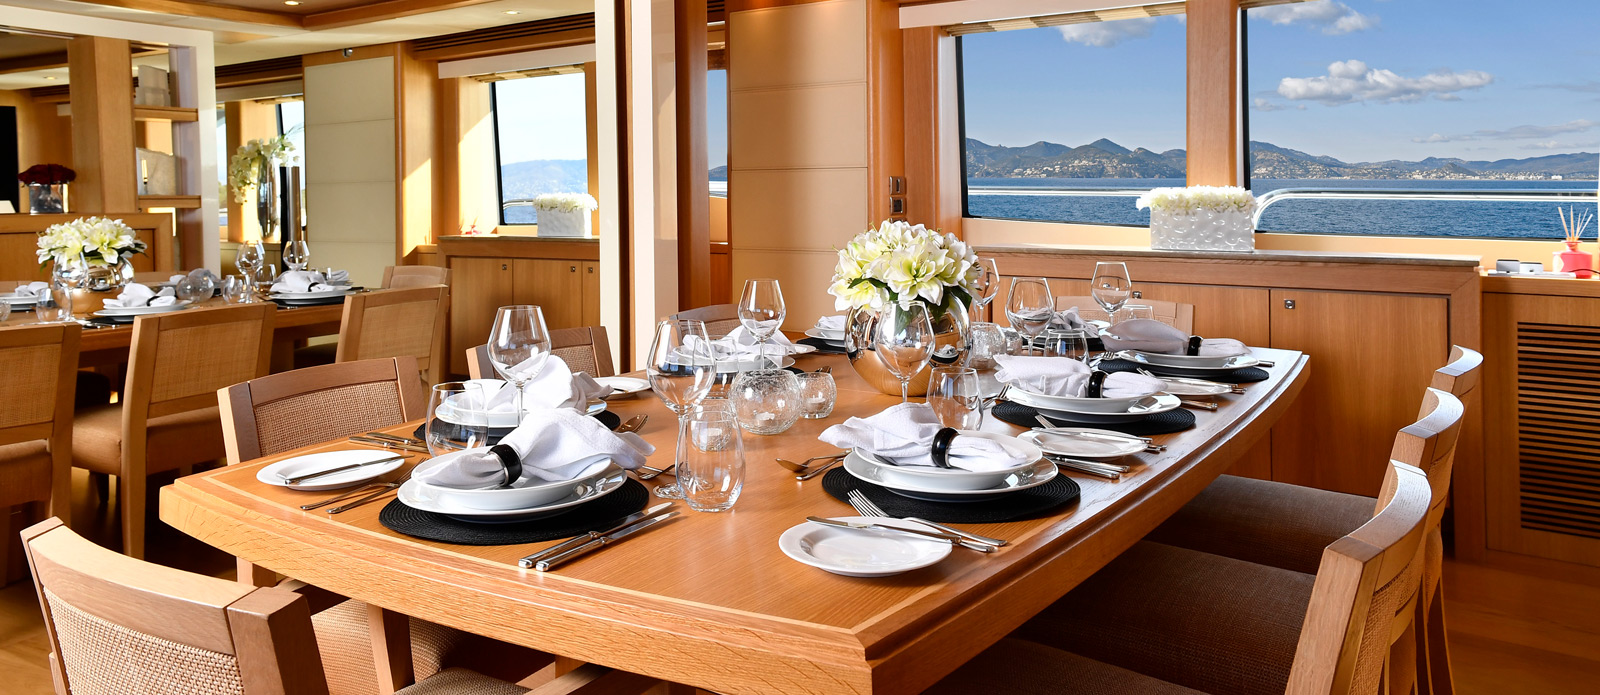 Sunseeker-34-Metre-Yacht---Emoji---Saloon-Dining-2